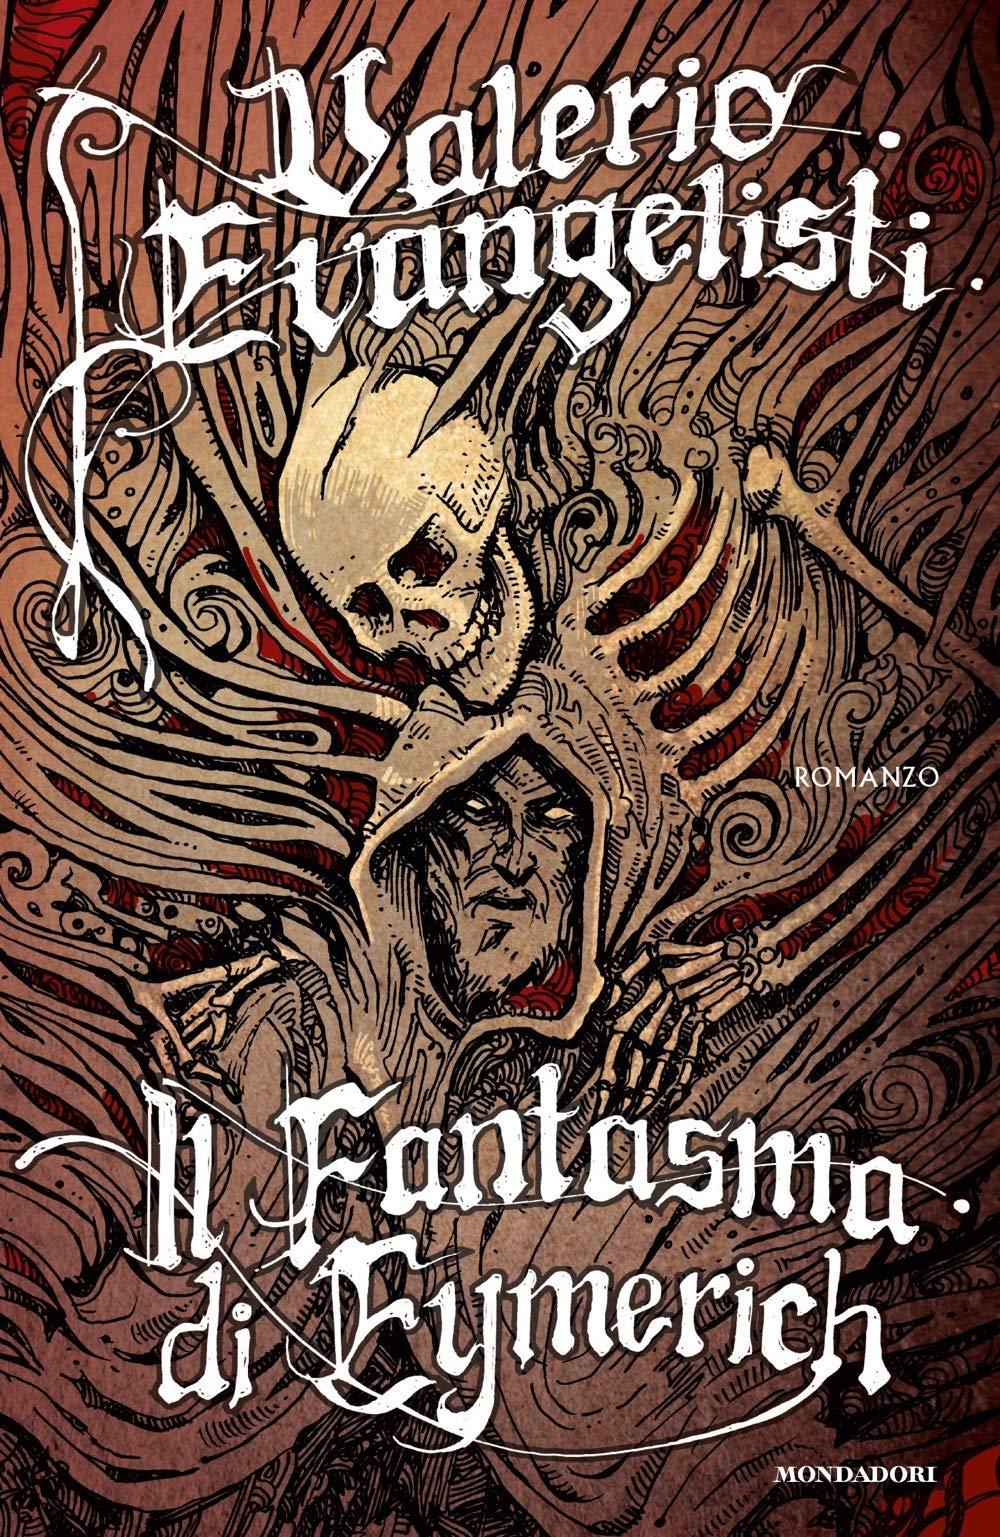 Il fantasma di Eymerich Copertina rigida – 23 ott 2018 Valerio Evangelisti Mondadori 8804702249 Fantascienza-fantasy